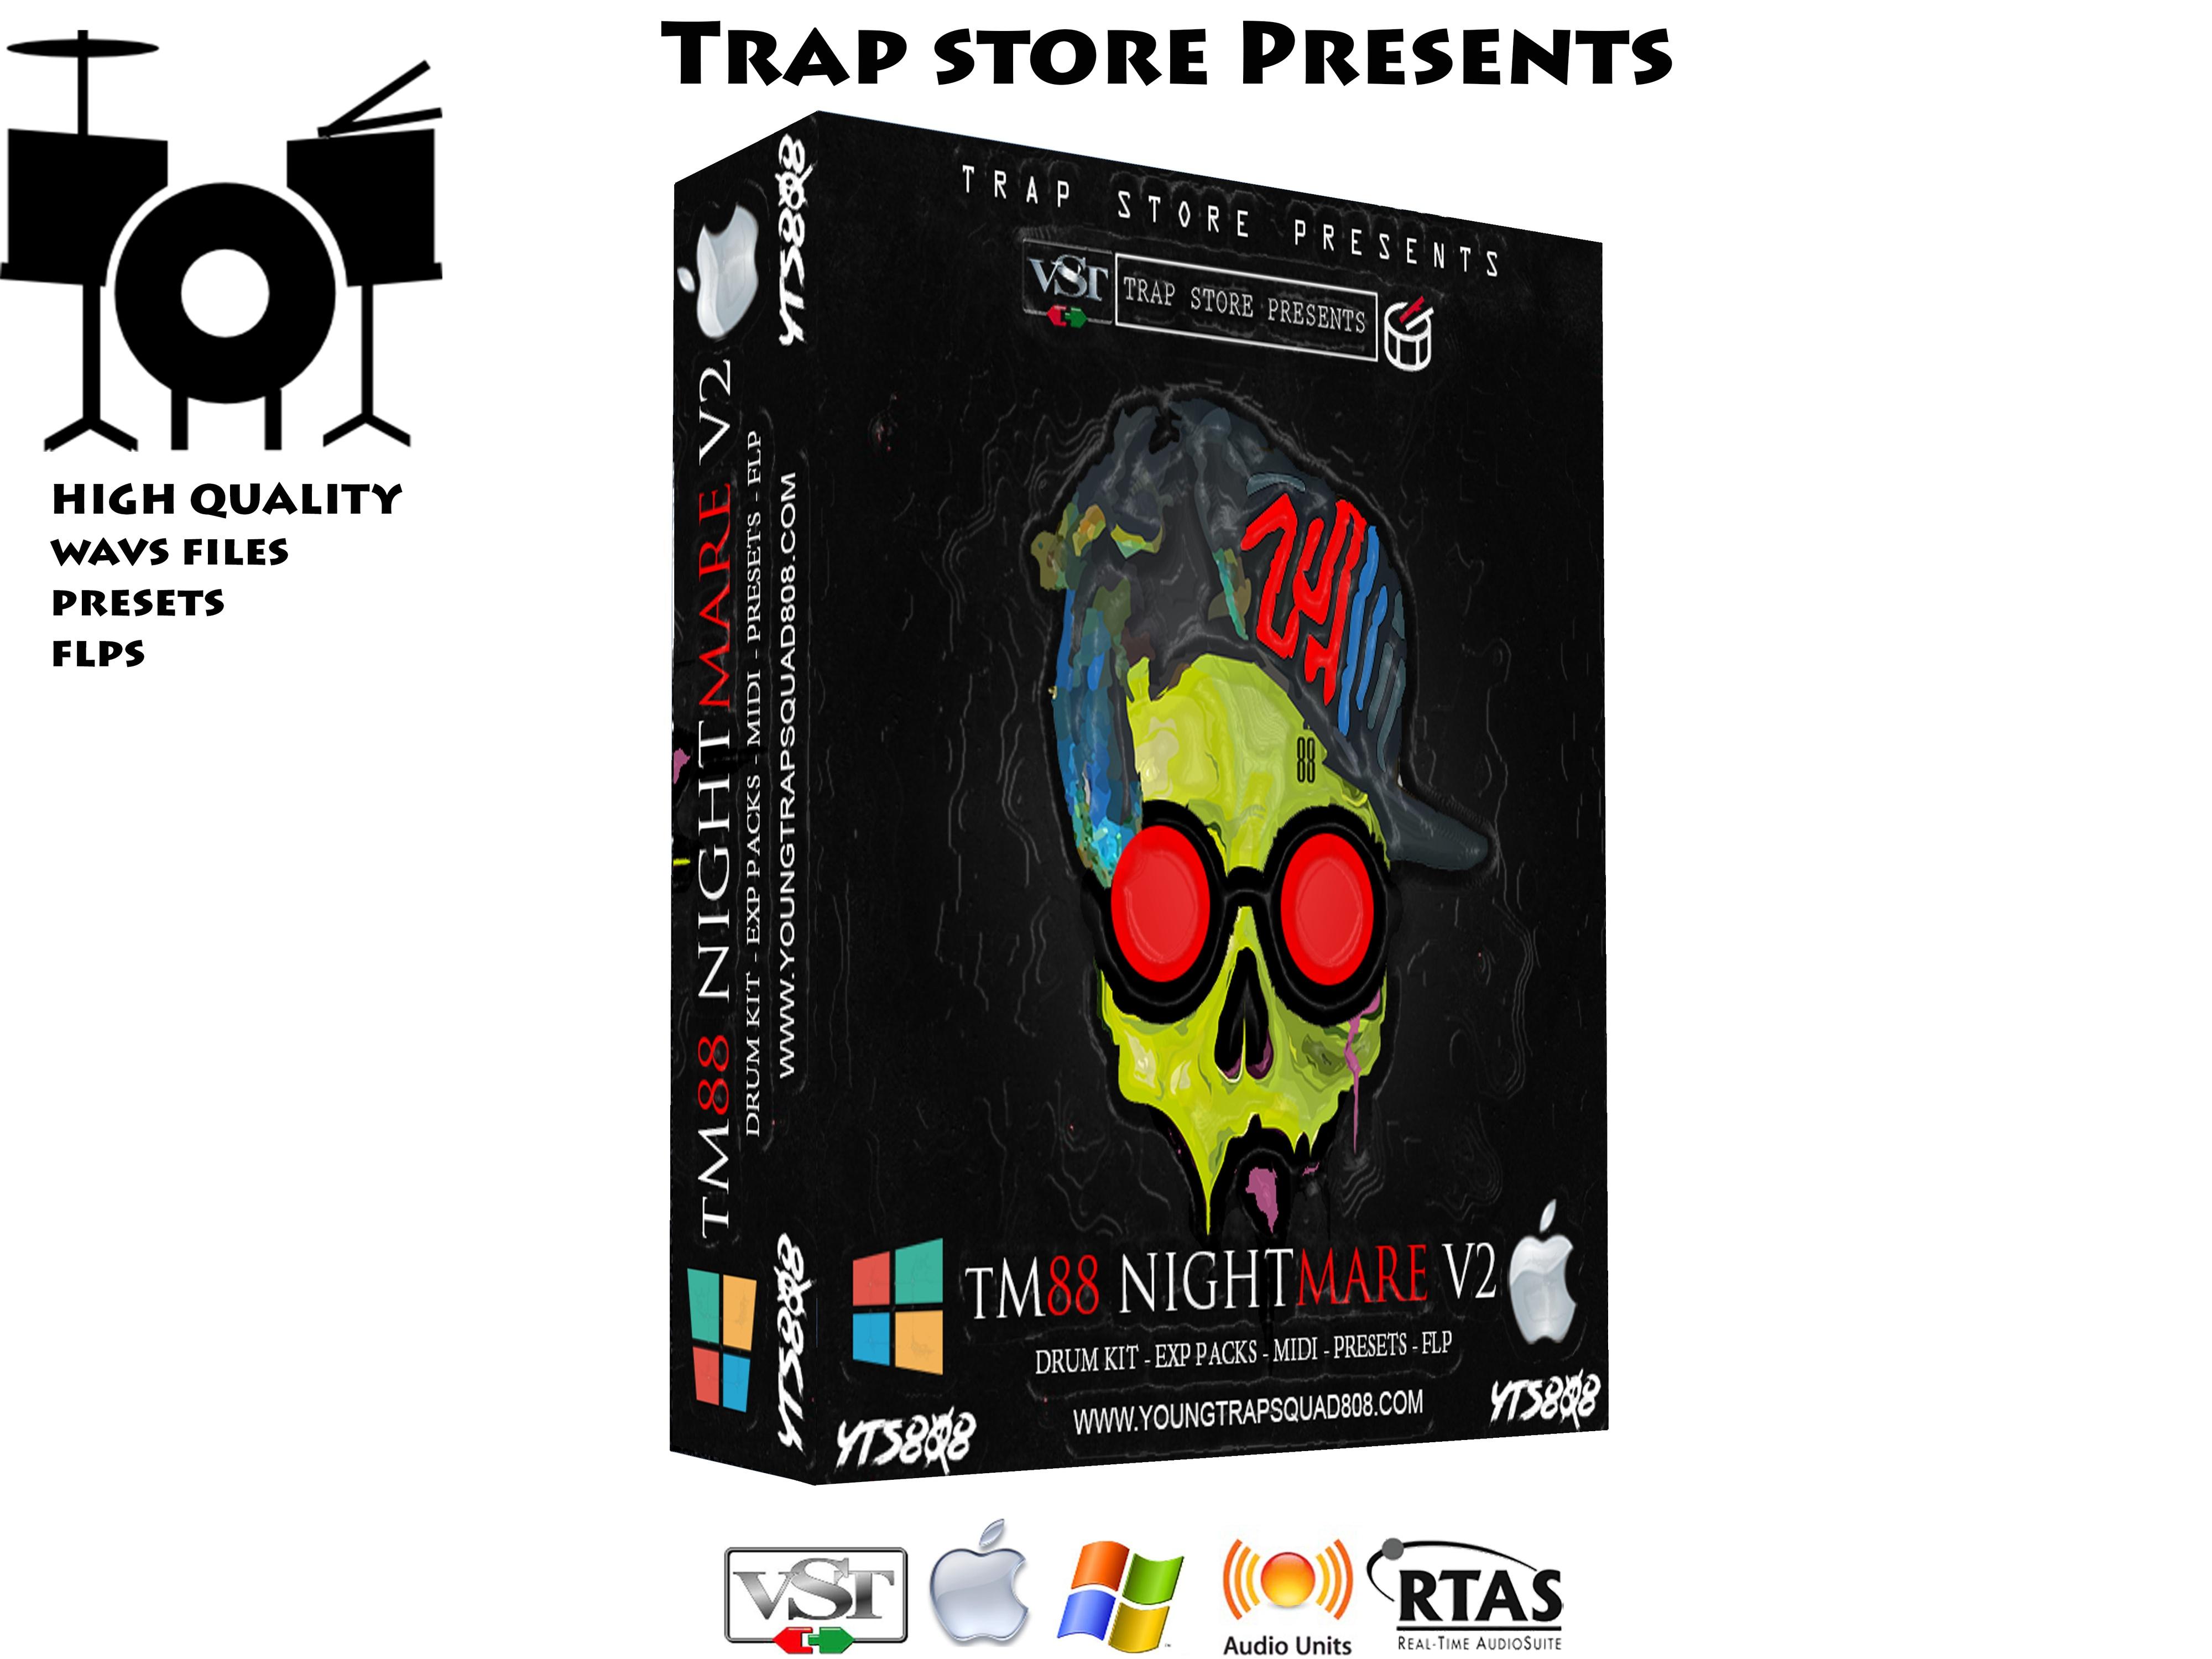 Trap Store Presents - TM88 NIGHTMARE V2